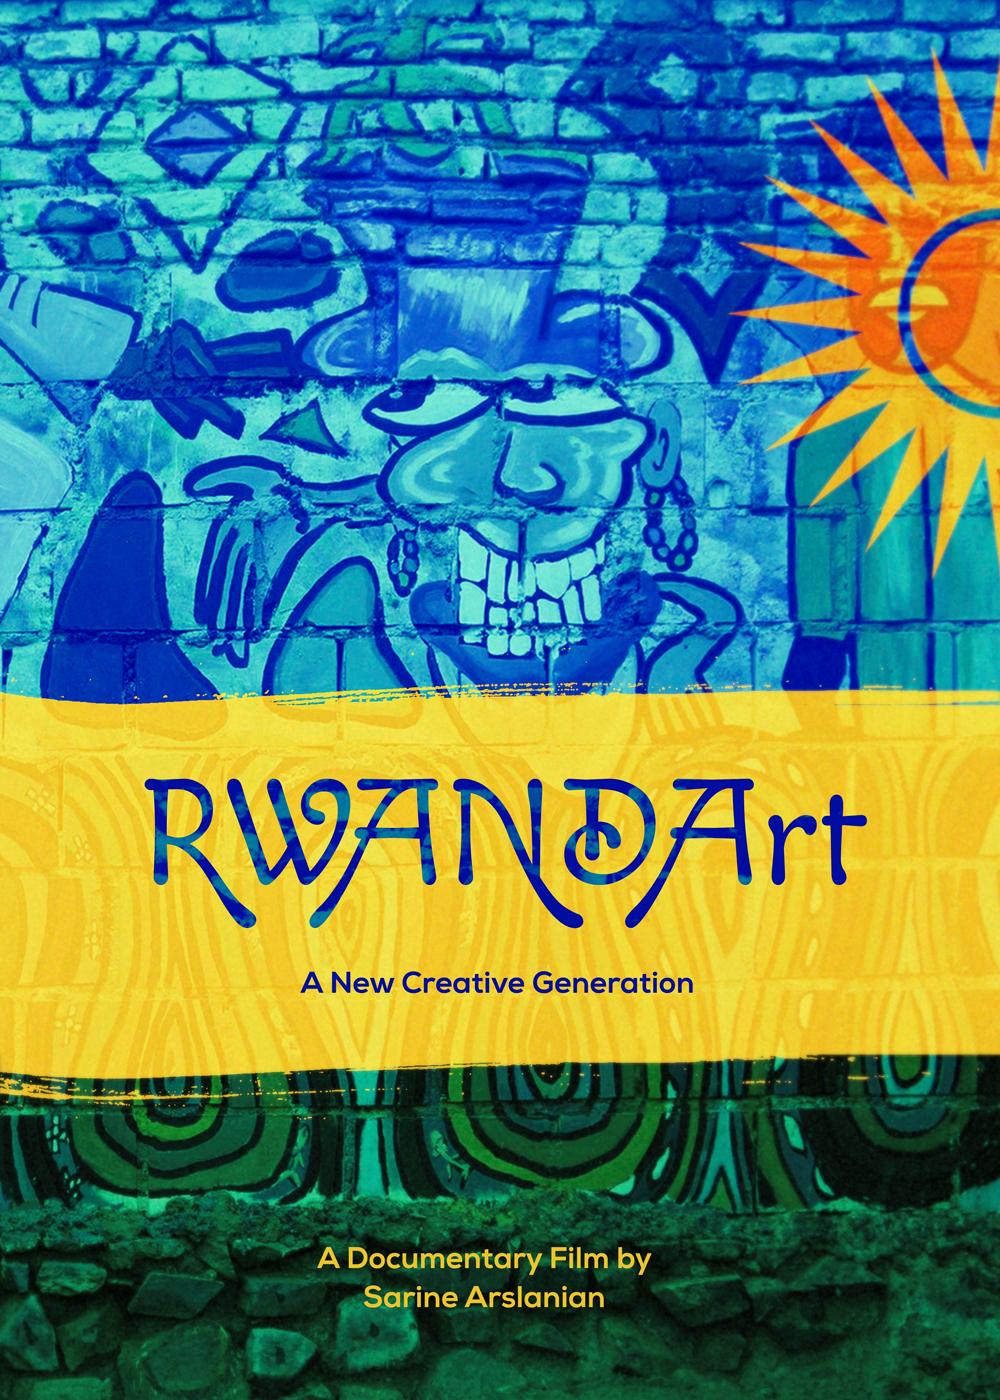 IN THE PRESS - TRUE Africa: Rwanda is about more than its past (or Kagame): http://trueafrica.co/article/the-creatives-forging-rwandas-future/LifeGate: RWANDArt, the documentary about young creatives putting Rwanda on the map: http://www.lifegate.com/people/news/rwandart-documentaryAfricavivre: RWANDART : le bouillonnement artistique rwandais: https://www.africavivre.com/rwanda/a-voir/documentaires/rwandart-le-bouillonnement-artistique-rwandais.htmlUK Visual Anthropology: RWANDArt-Alumni Sarine Arslanian shares her latest project: https://ukvisualanthropology.com/2017/06/23/rwandart/Igihe: Iserukiramuco Rwanda Film Festival rigiye kubera muri Convention Center: http://www.igihe.com/imyidagaduro/sinema/article/iserukiramuco-rwanda-film-festival-rigiye-kubera-muri-convention-centerIgihe: Ubushake bw'urubyiruko mu gukora sinema mu Rwanda buratanga icyizere cy'ejo heza (Video): https://igihe.com/imyidagaduro/sinema/article/ubushake-bw-urubyiruko-mu-gukora-sinema-mu-rwanda-buratanga-icyizere-cy-ejo